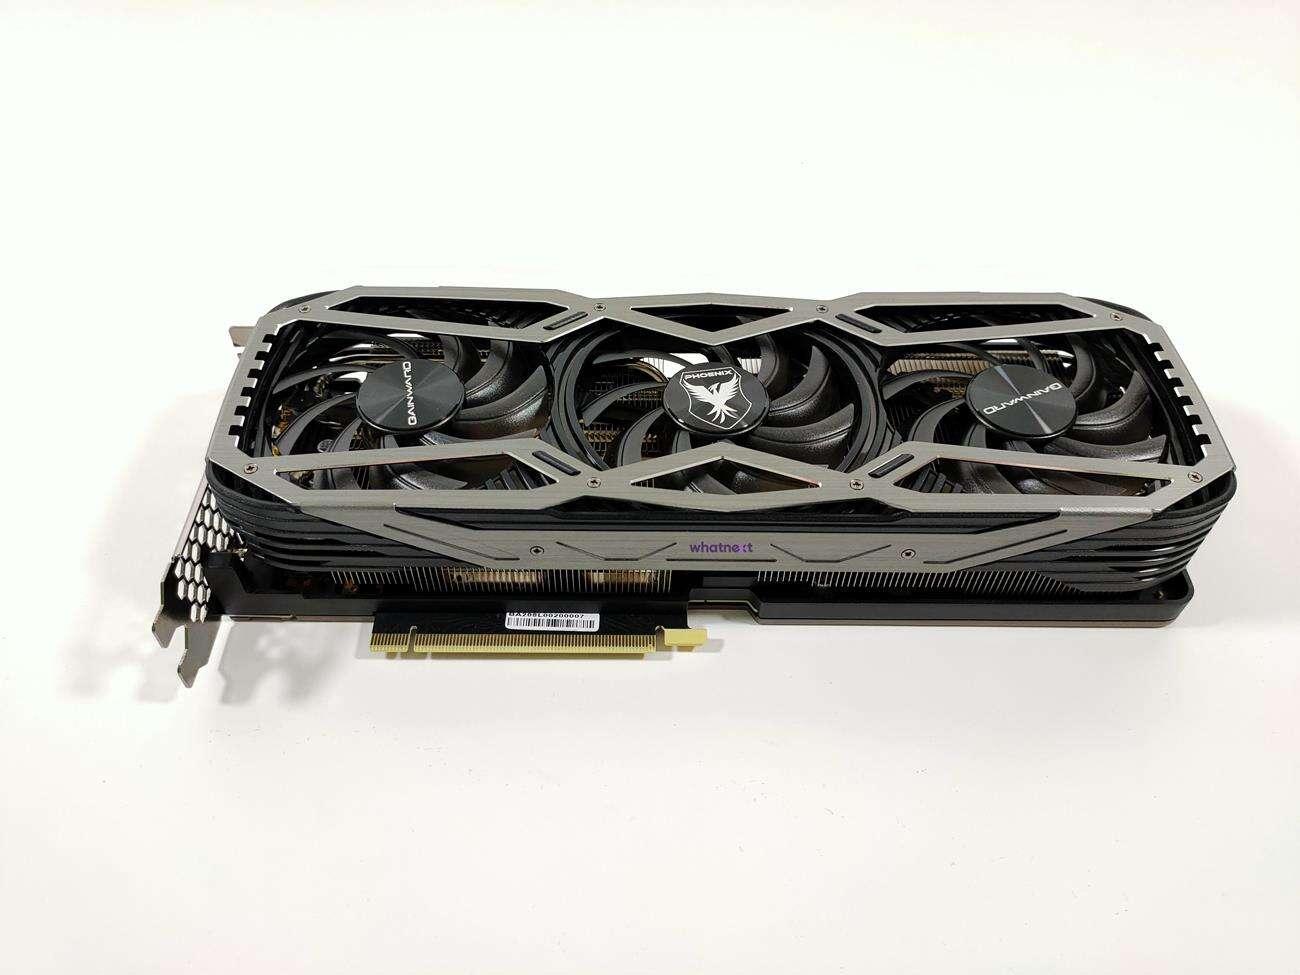 test Gainward GeForce RTX 3080 Phoenix GS, recenzja Gainward GeForce RTX 3080 Phoenix GS, review Gainward GeForce RTX 3080 Phoenix GS, opinia Gainward GeForce RTX 3080 Phoenix GS